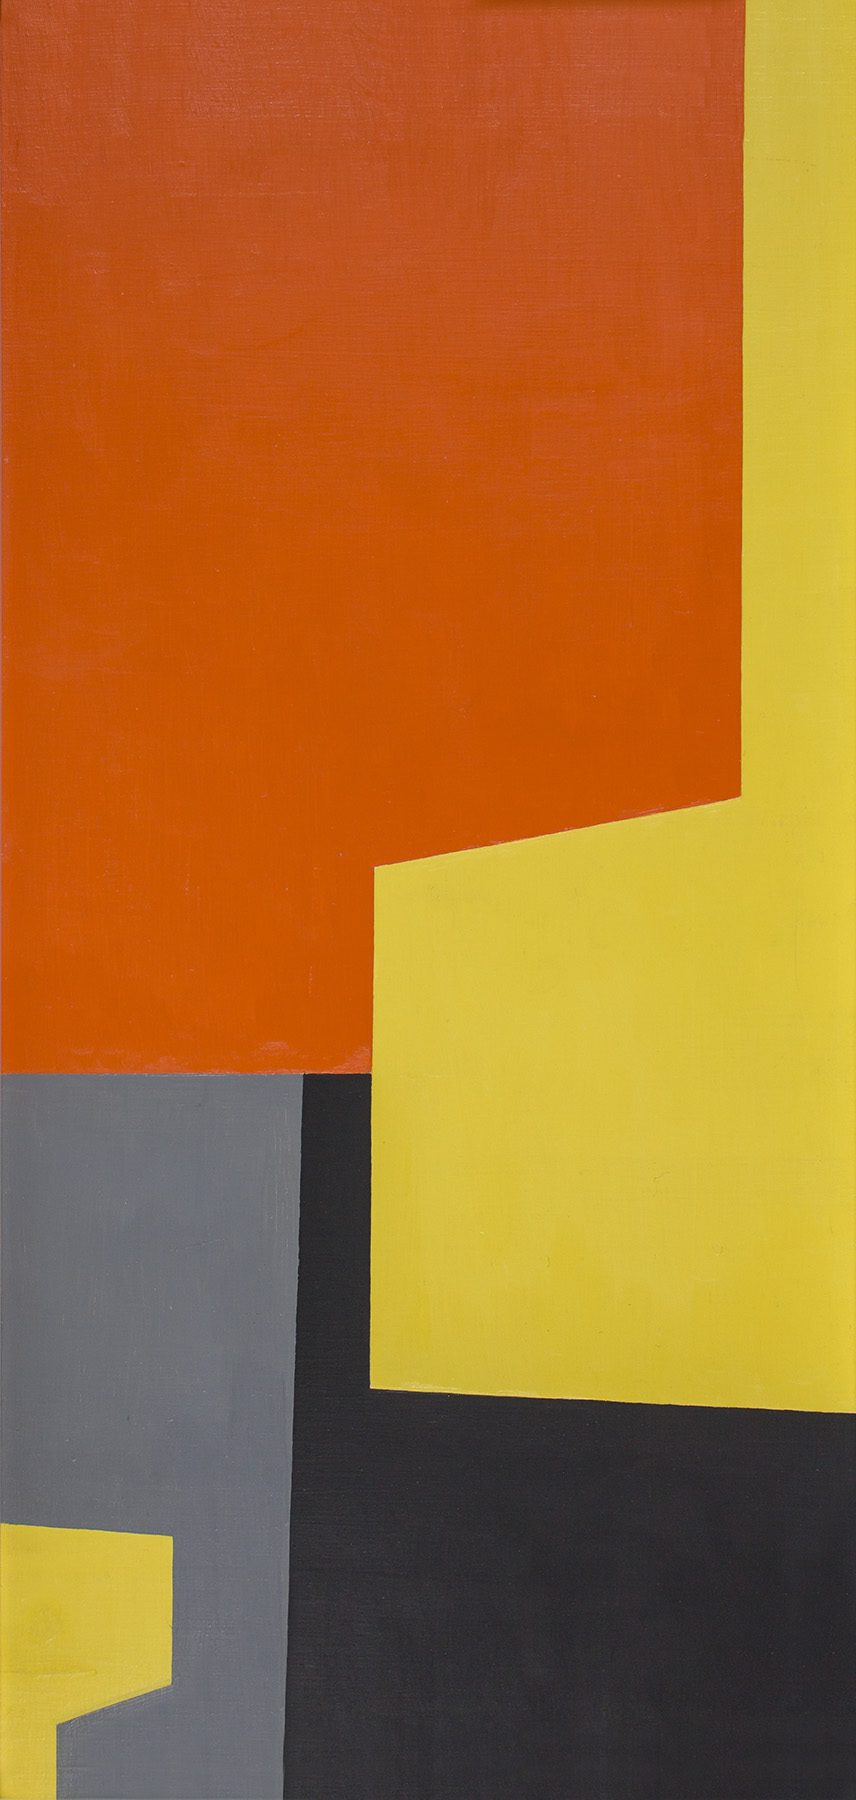 Christian Roeckenschuss   K517, 38 x 79 cm, 1955, Holz farbig gefasst